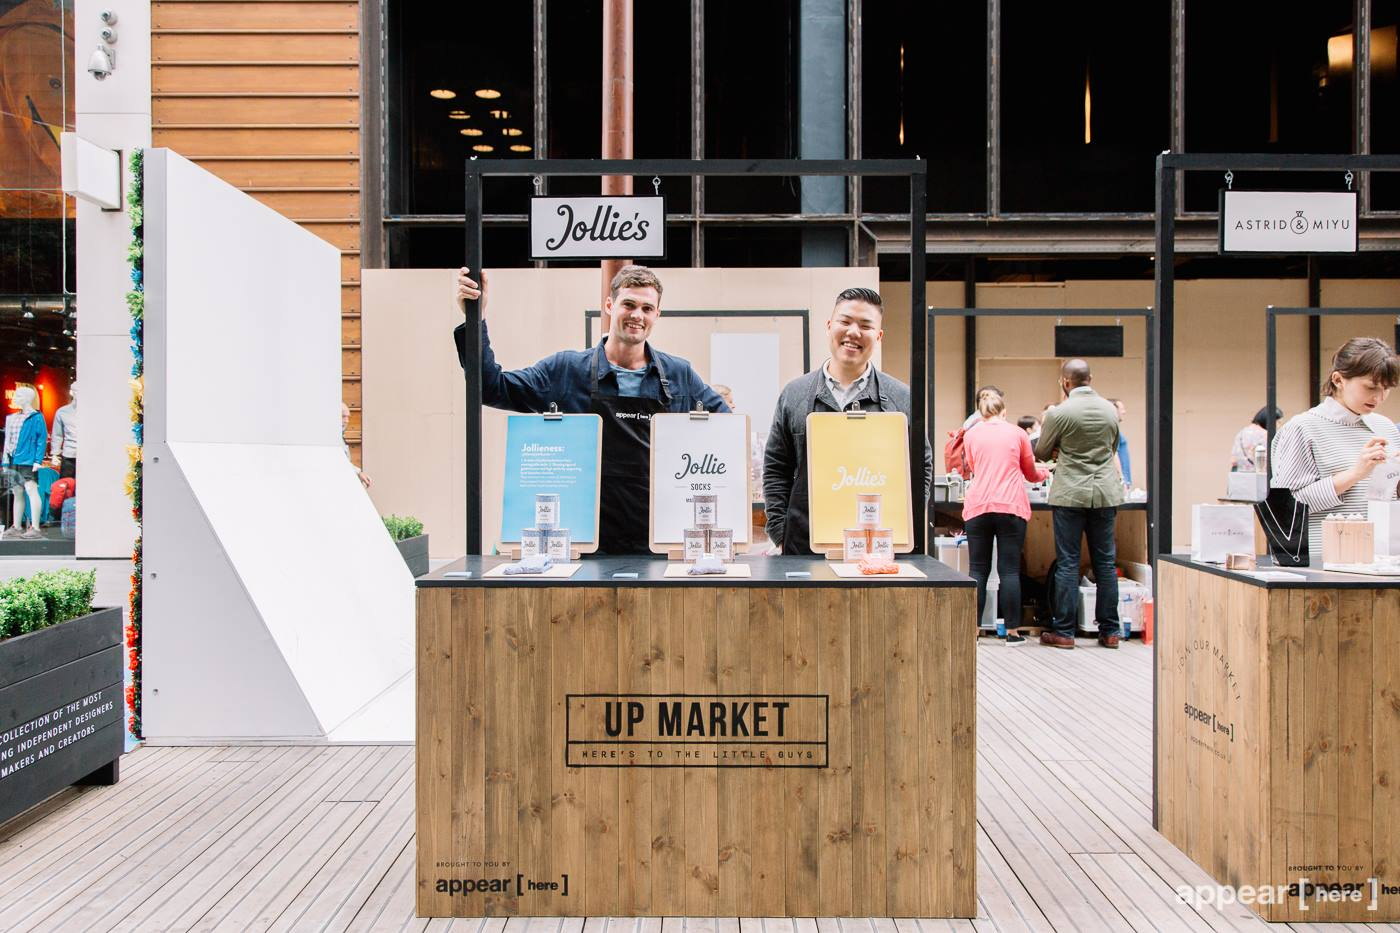 Market_stall2.jpg